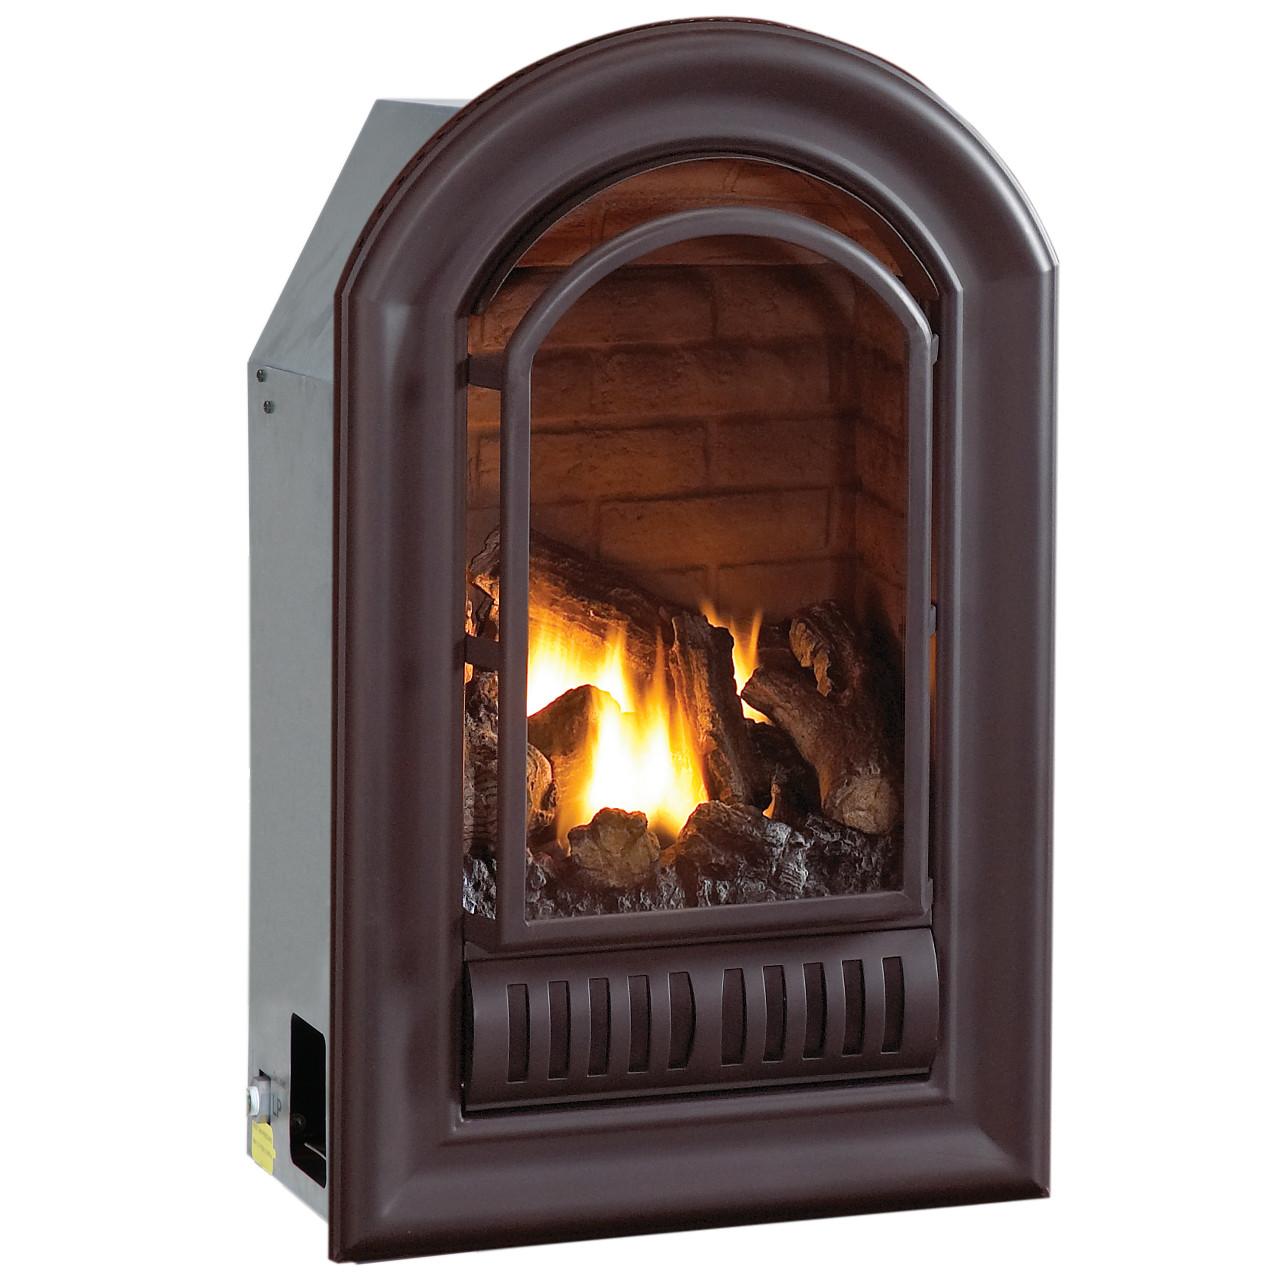 hearthsense a series liquid propane ventless fireplace insert rh factorybuysdirect com ventless propane fireplace canada ventless propane fireplace canada